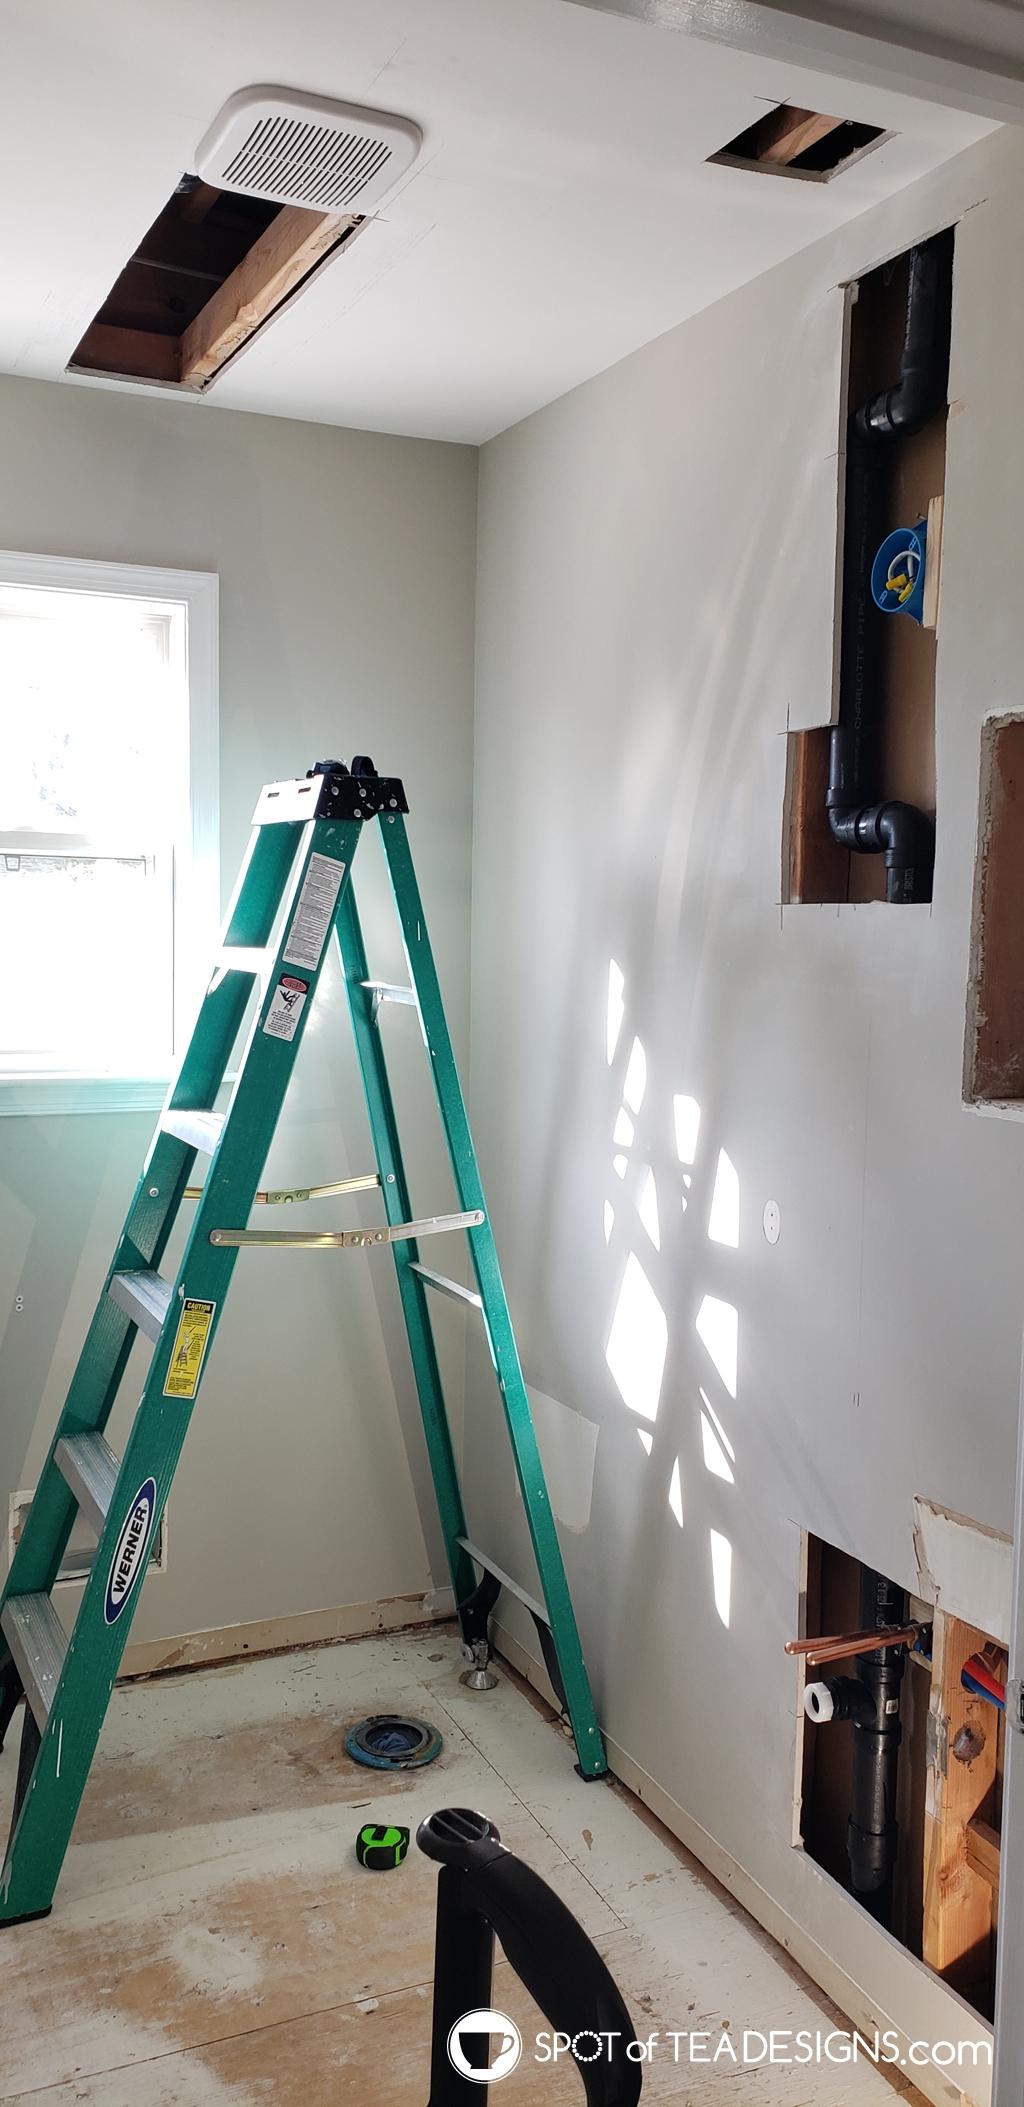 Modern Half Bathroom Remodel - in progress construction | spotofteadesigns.com